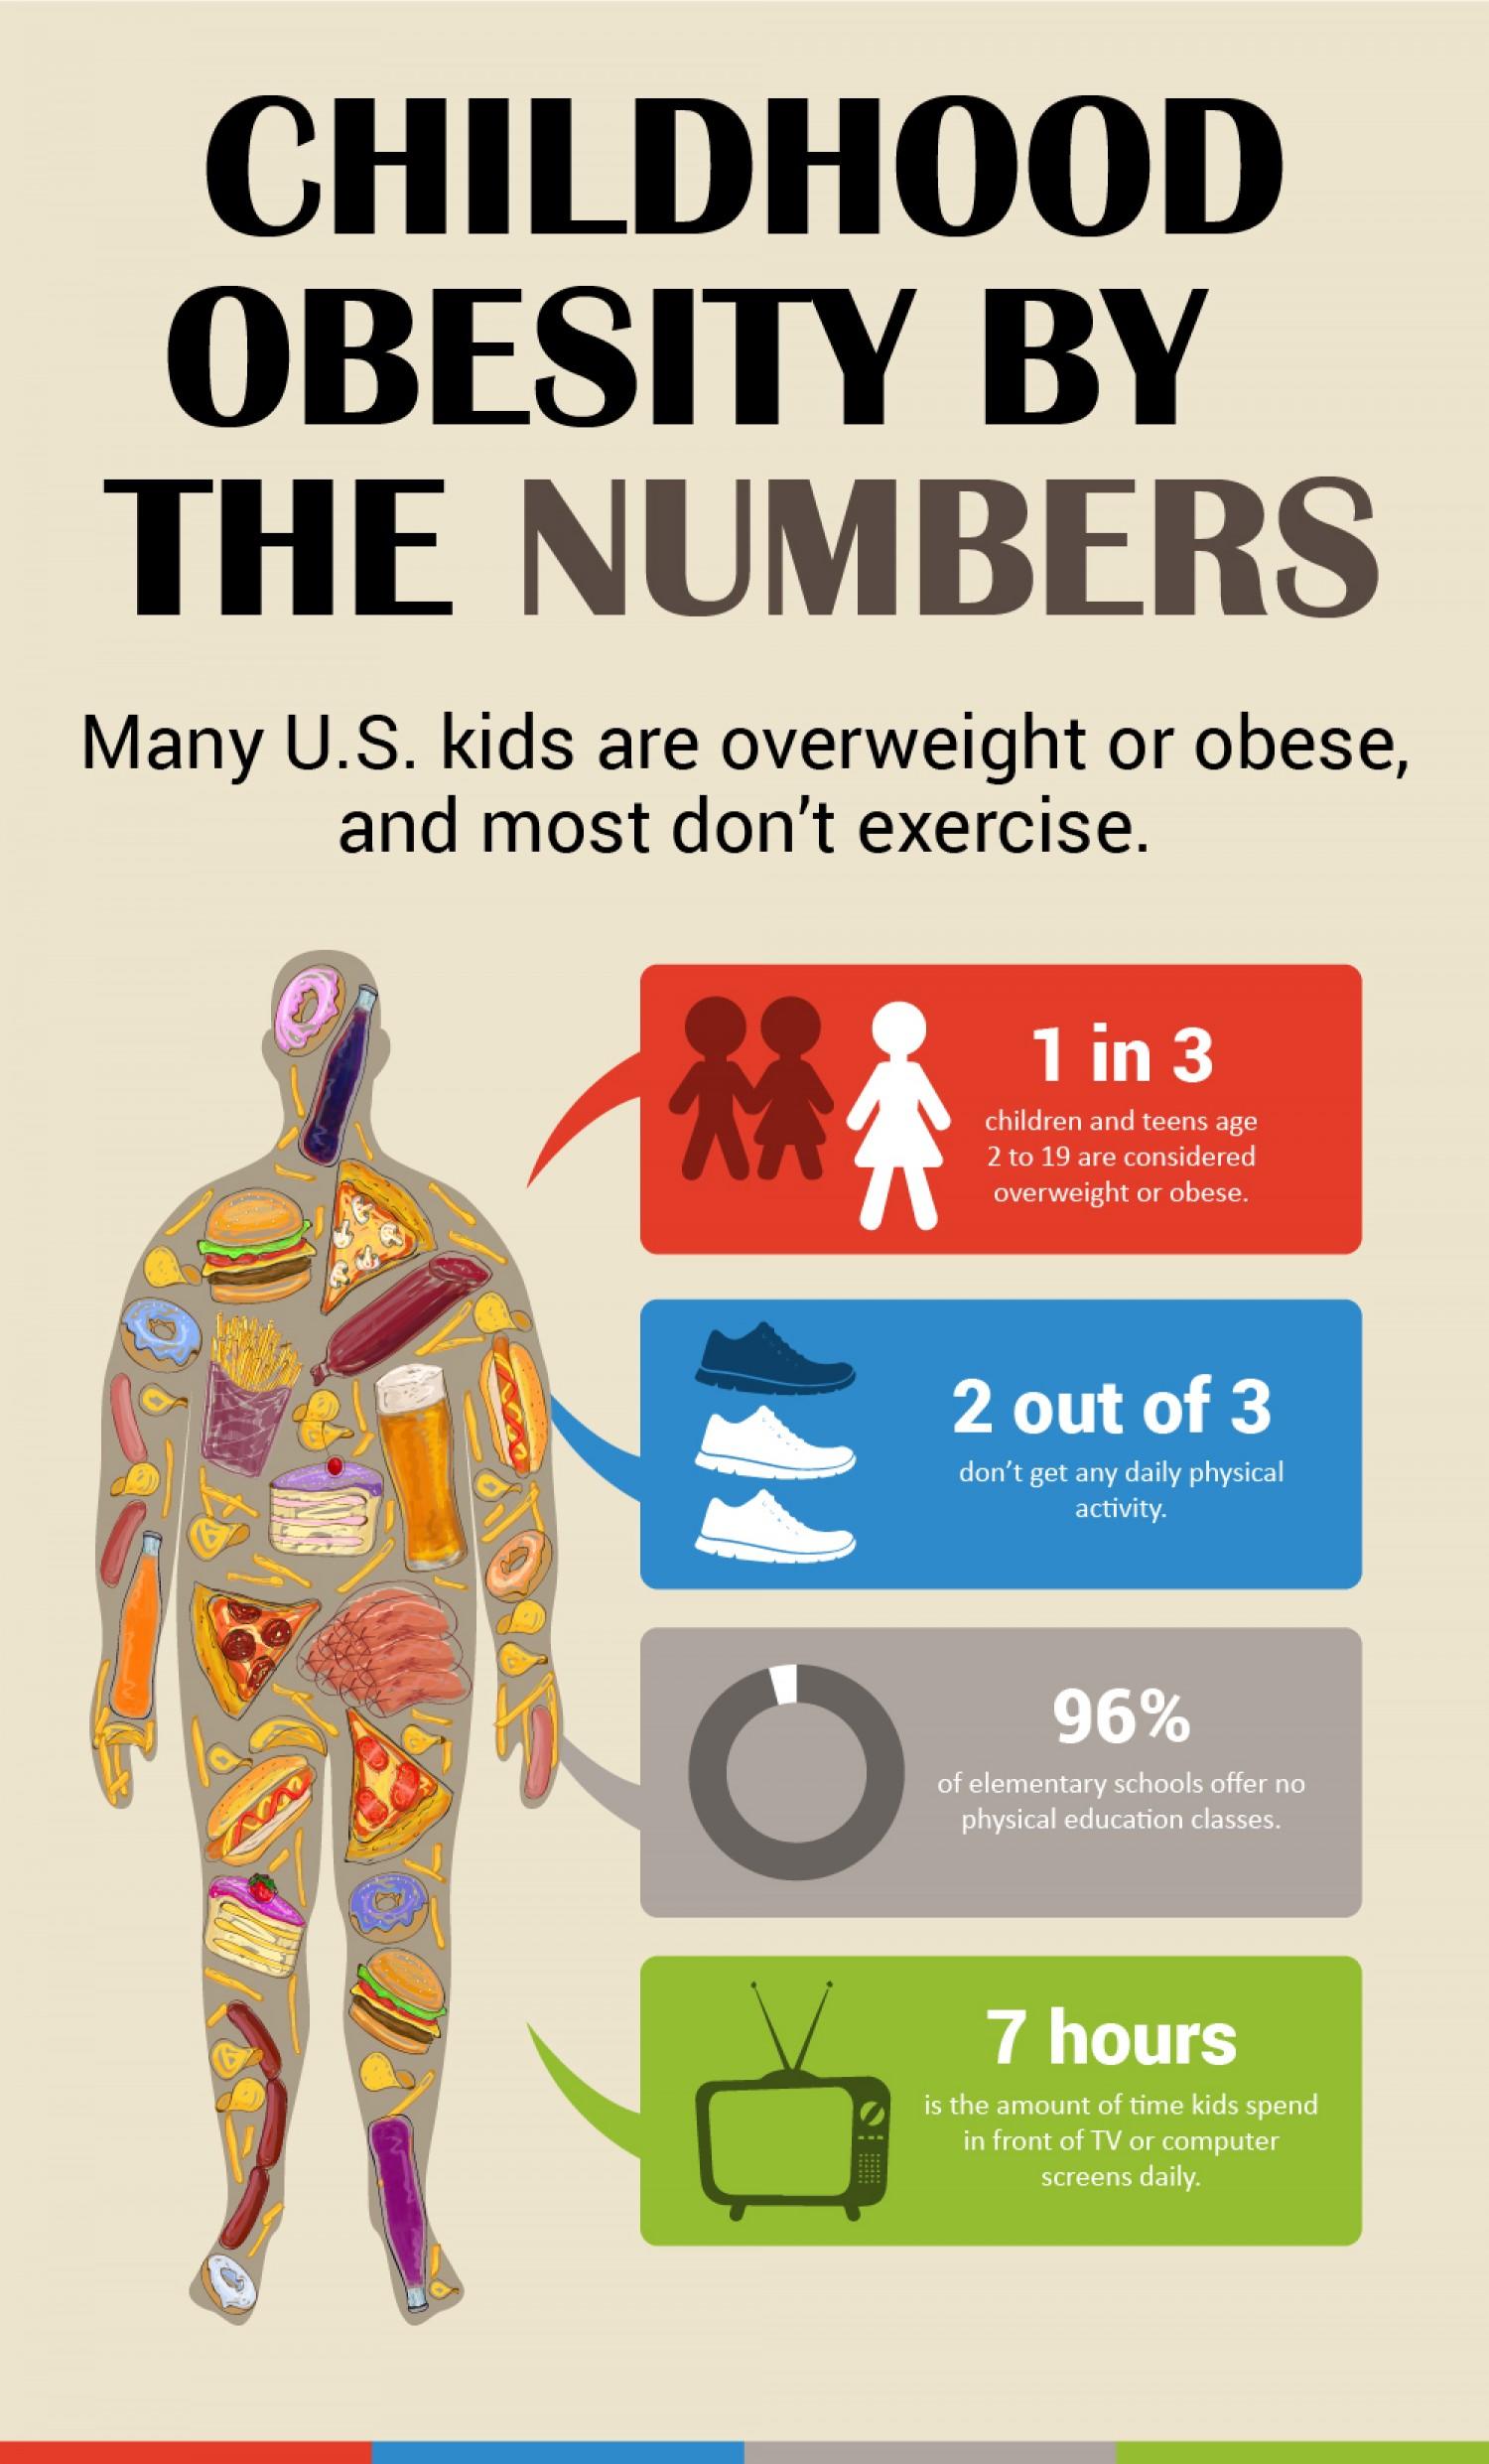 https://thumbnails-visually.netdna-ssl.com/obesity-in-children_5551a4523d651_w1500.jpg